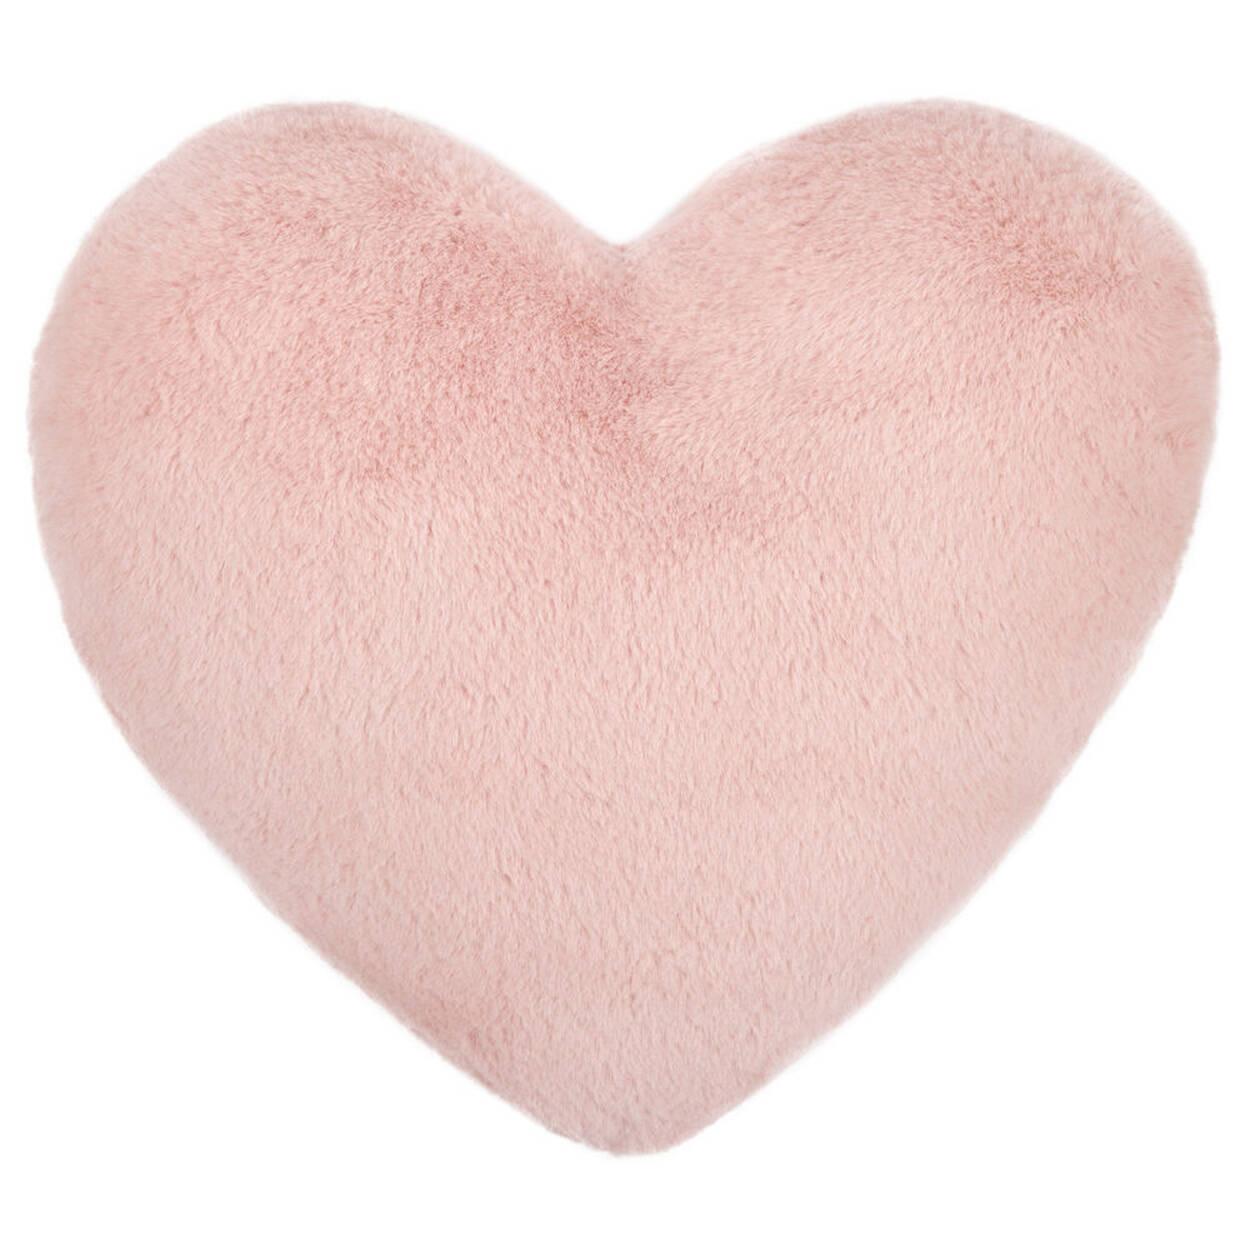 "Wila Heart-Shaped Decorative Pillow 14"" X 15"""